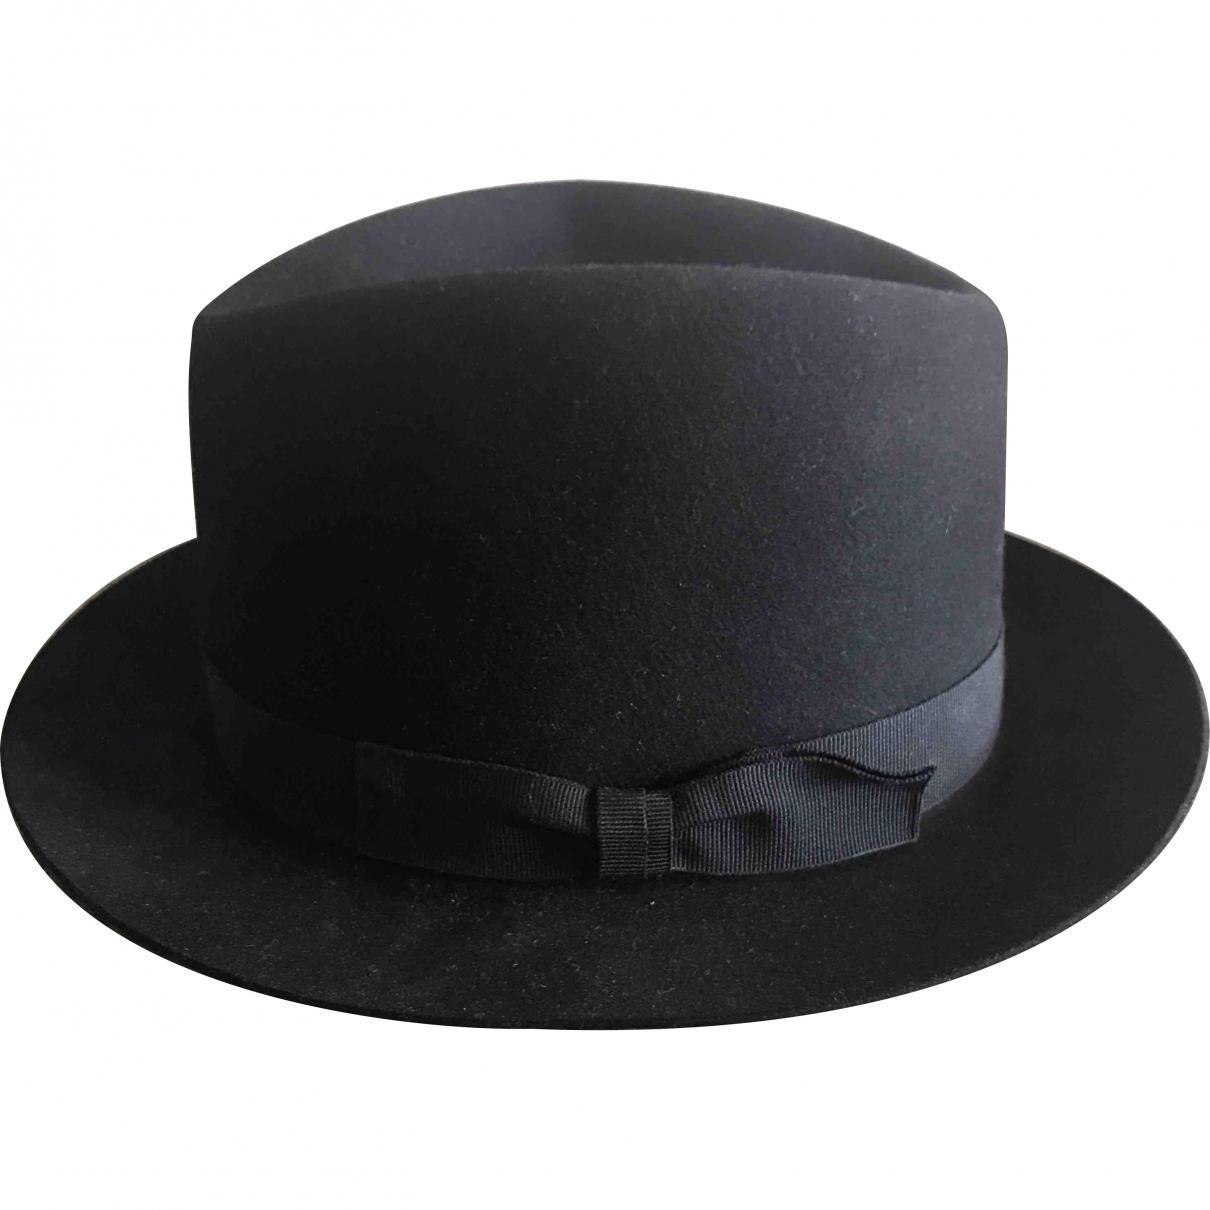 Hermès Pre-owned Beaver Hat in Black for Men - Lyst 69260fef39b8